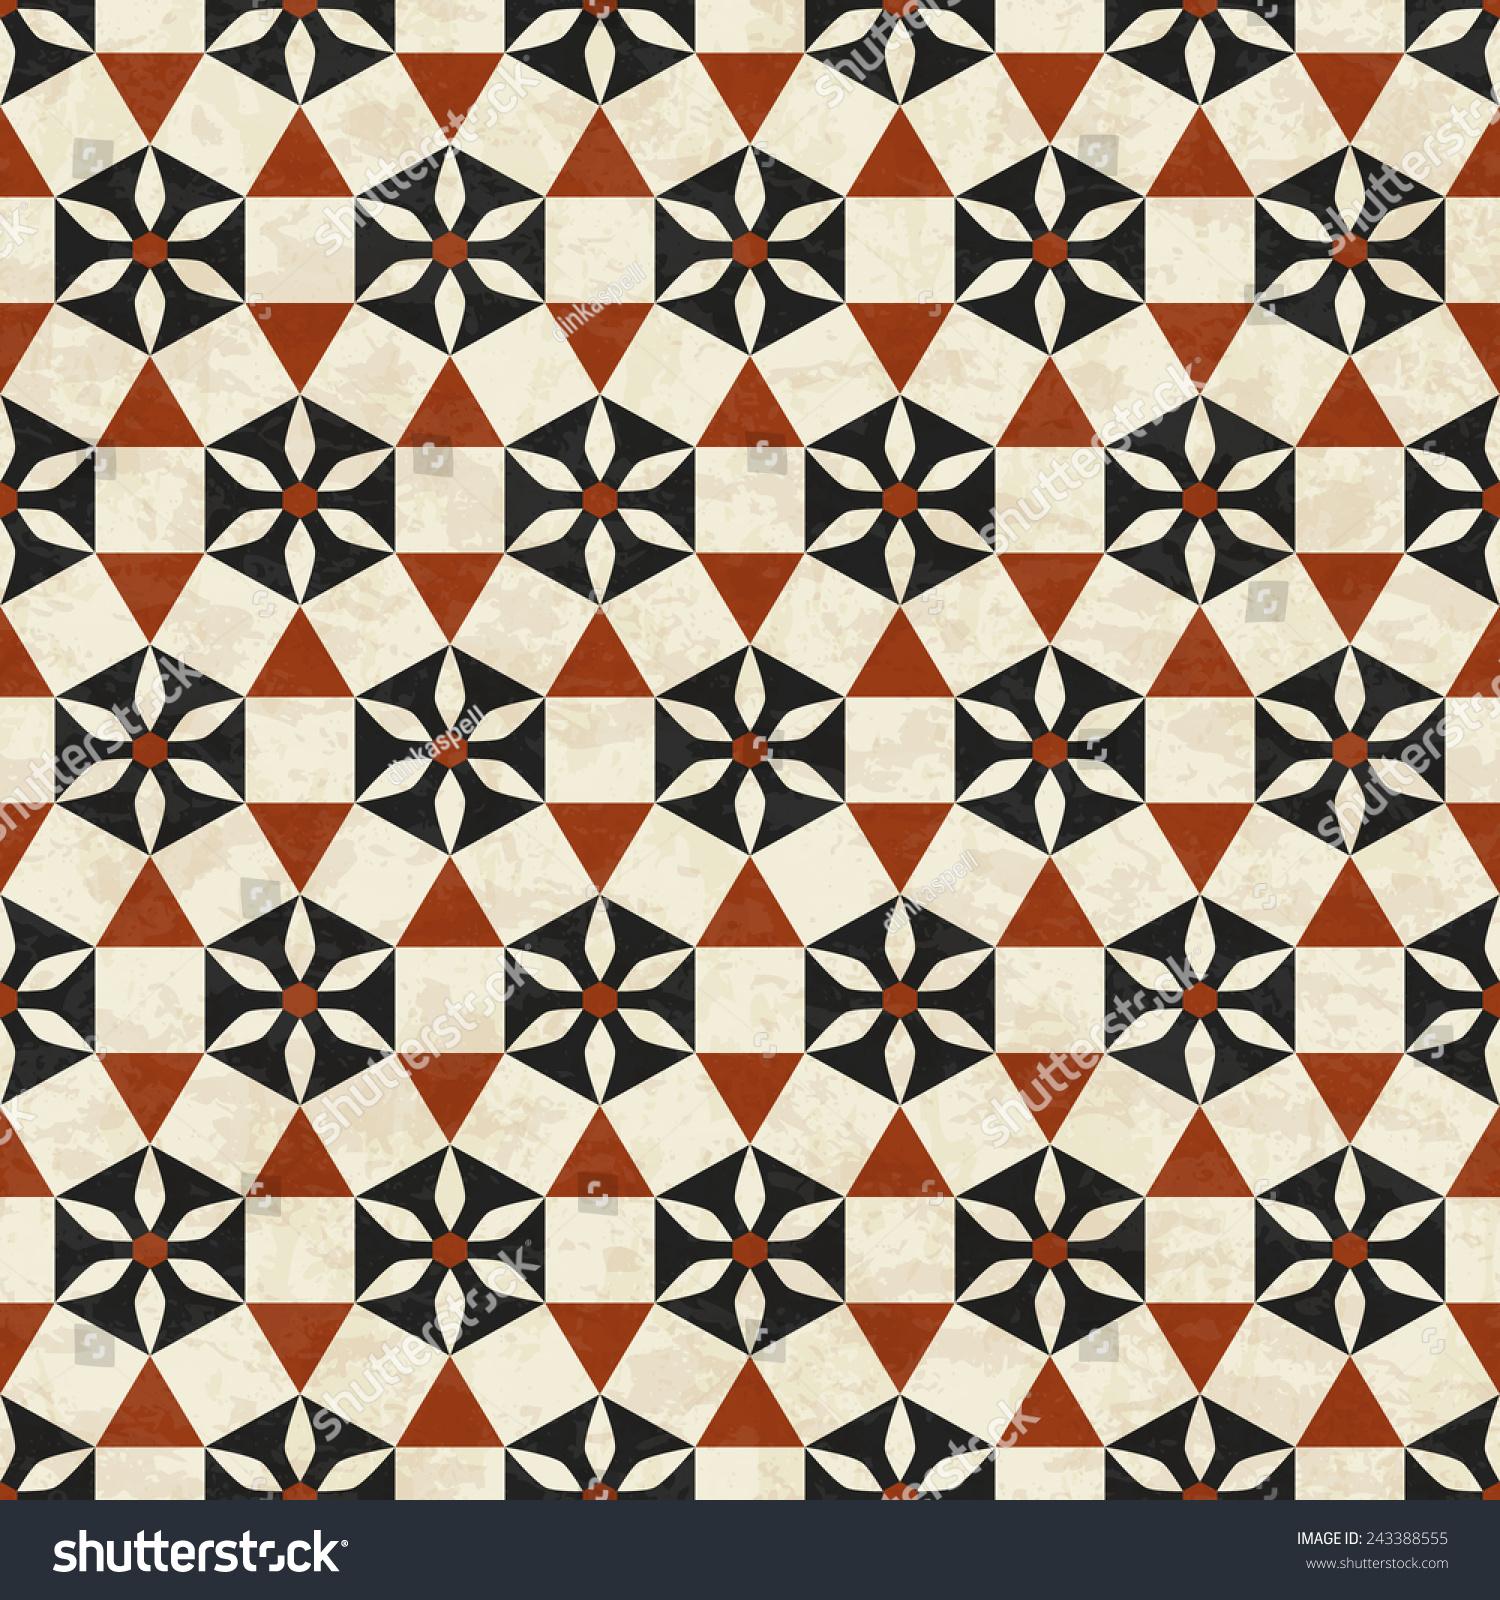 Image Result For Tiles For Floor